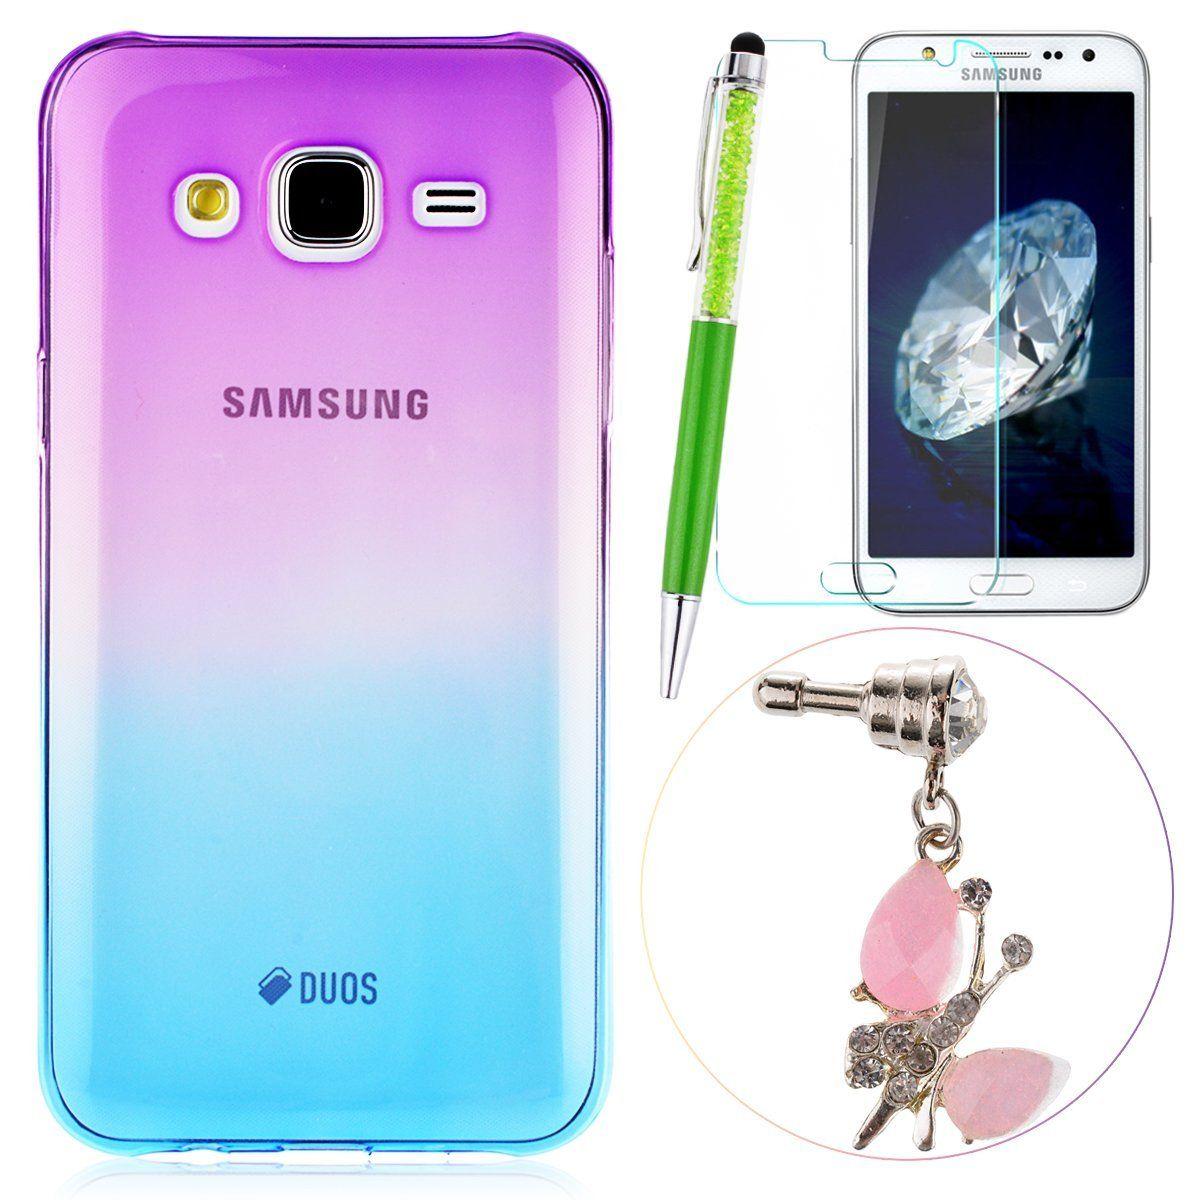 Gradient Case For Samsung Galaxy J5 Grandever Purple Yellow Gradient Silicone Cover Soft Tpu Back Cover Colourful Gradient Cover Capa De Celular Celular Ideias